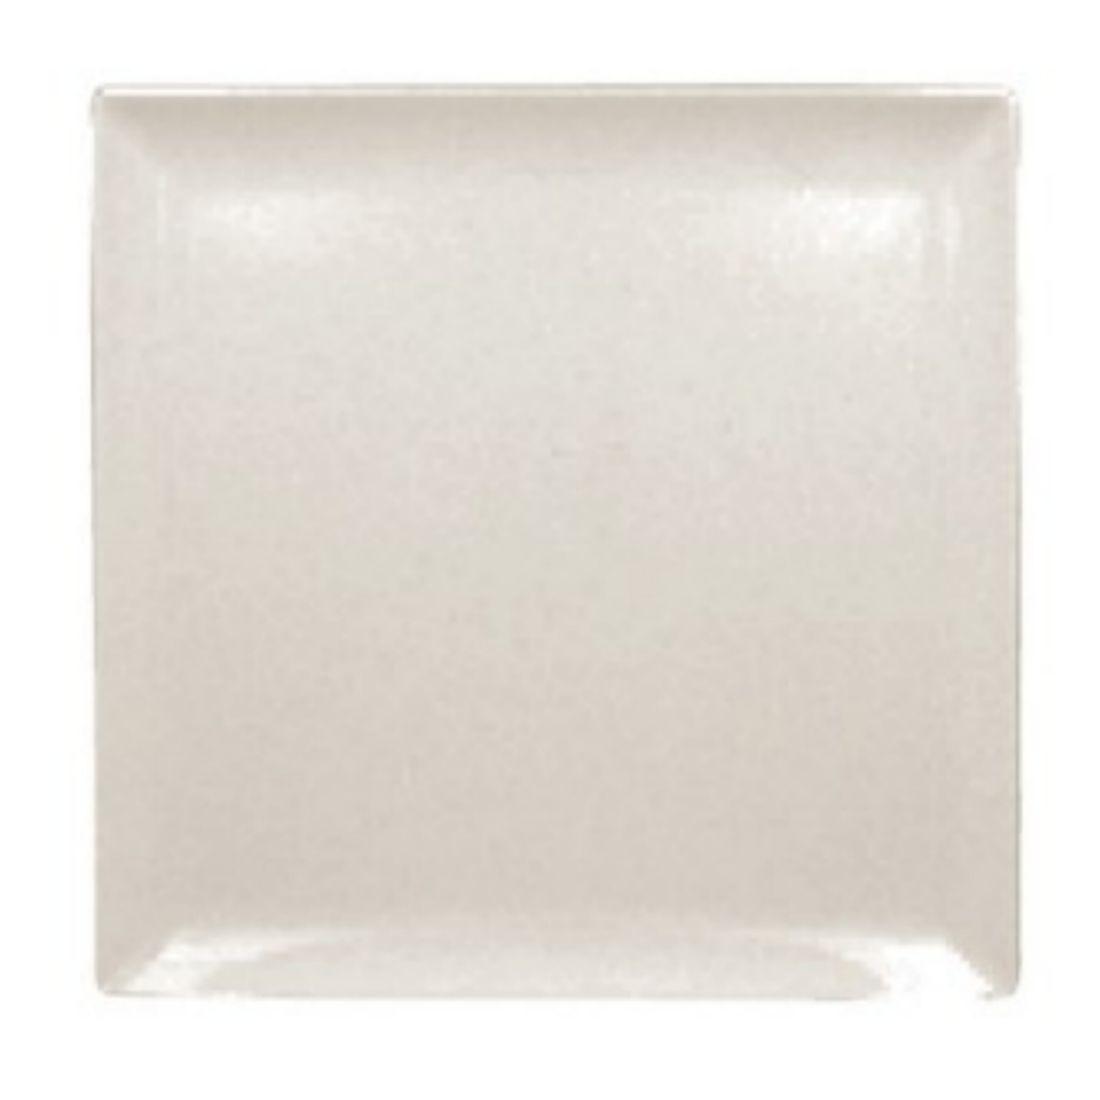 Nano talíř mělký - čtvercový 27 cm